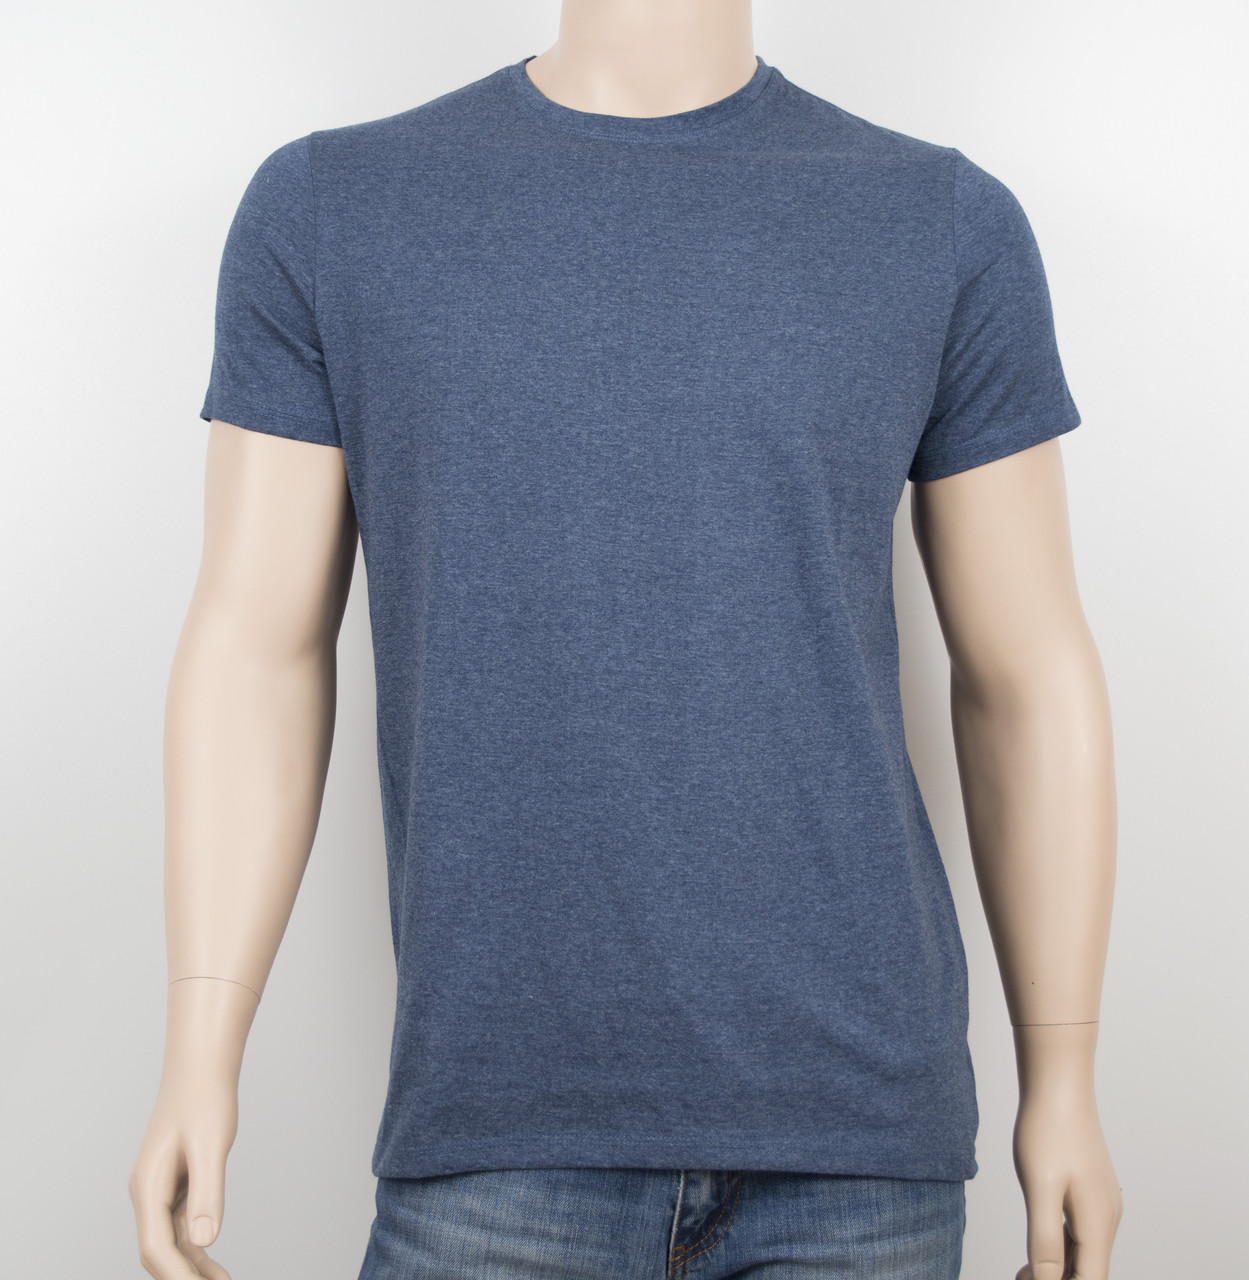 Мужская однотонная футболка 100% х/б 19002 джинс